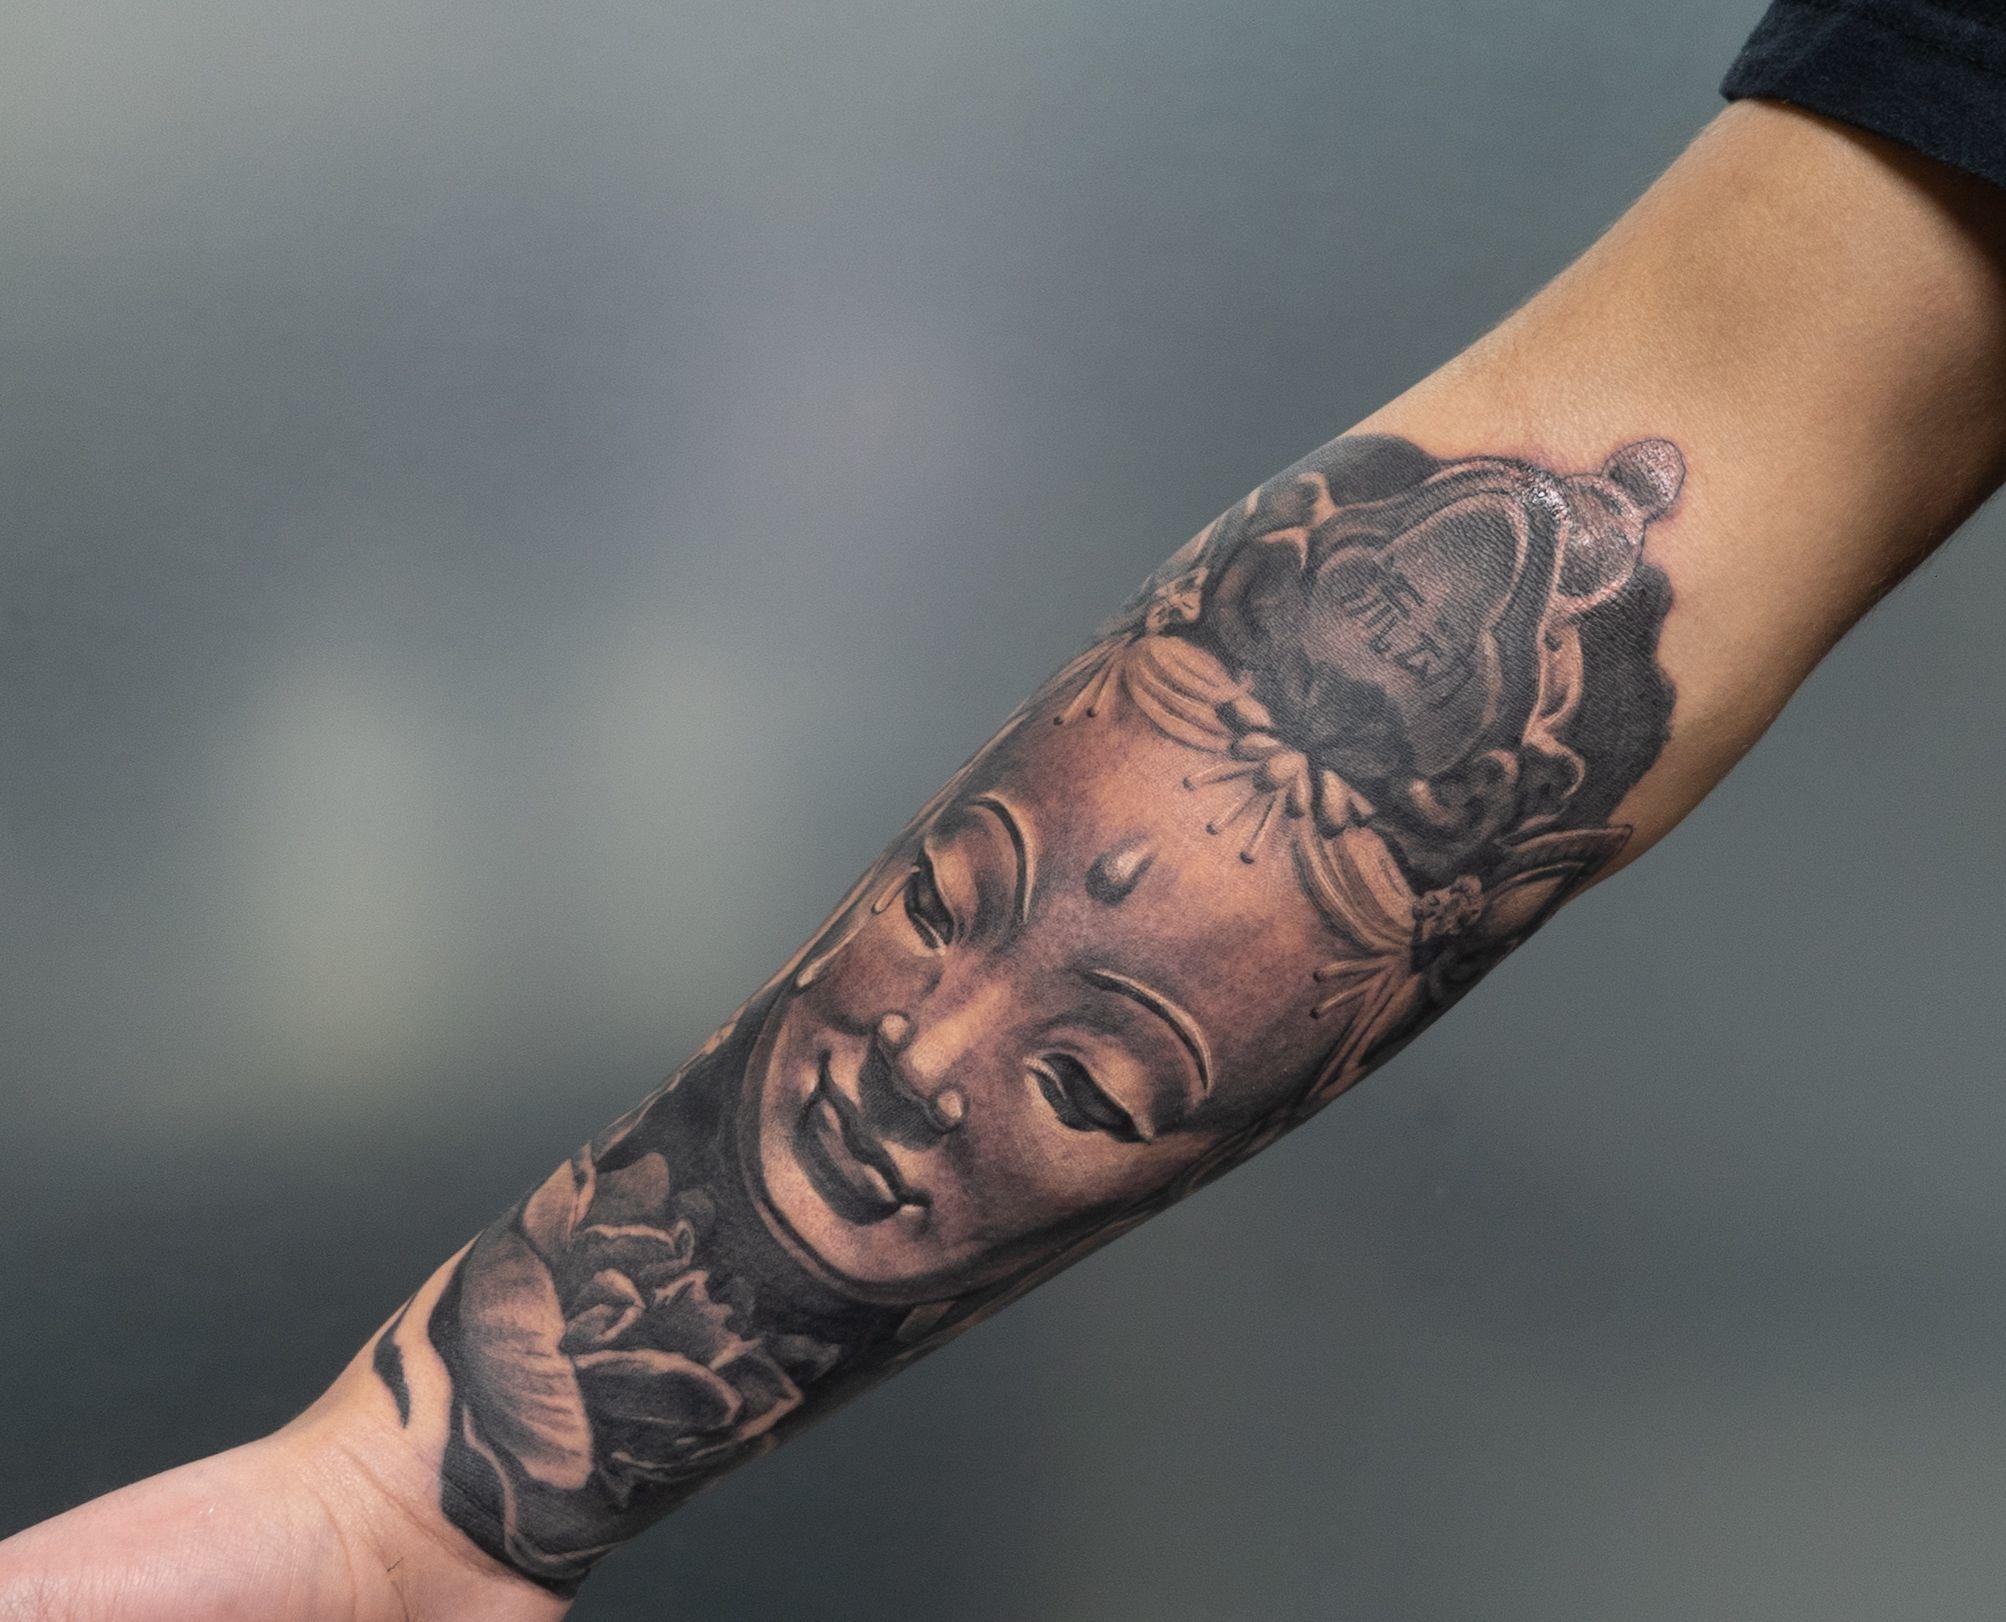 Buddha displayed in black and grey tattoo work tattoos